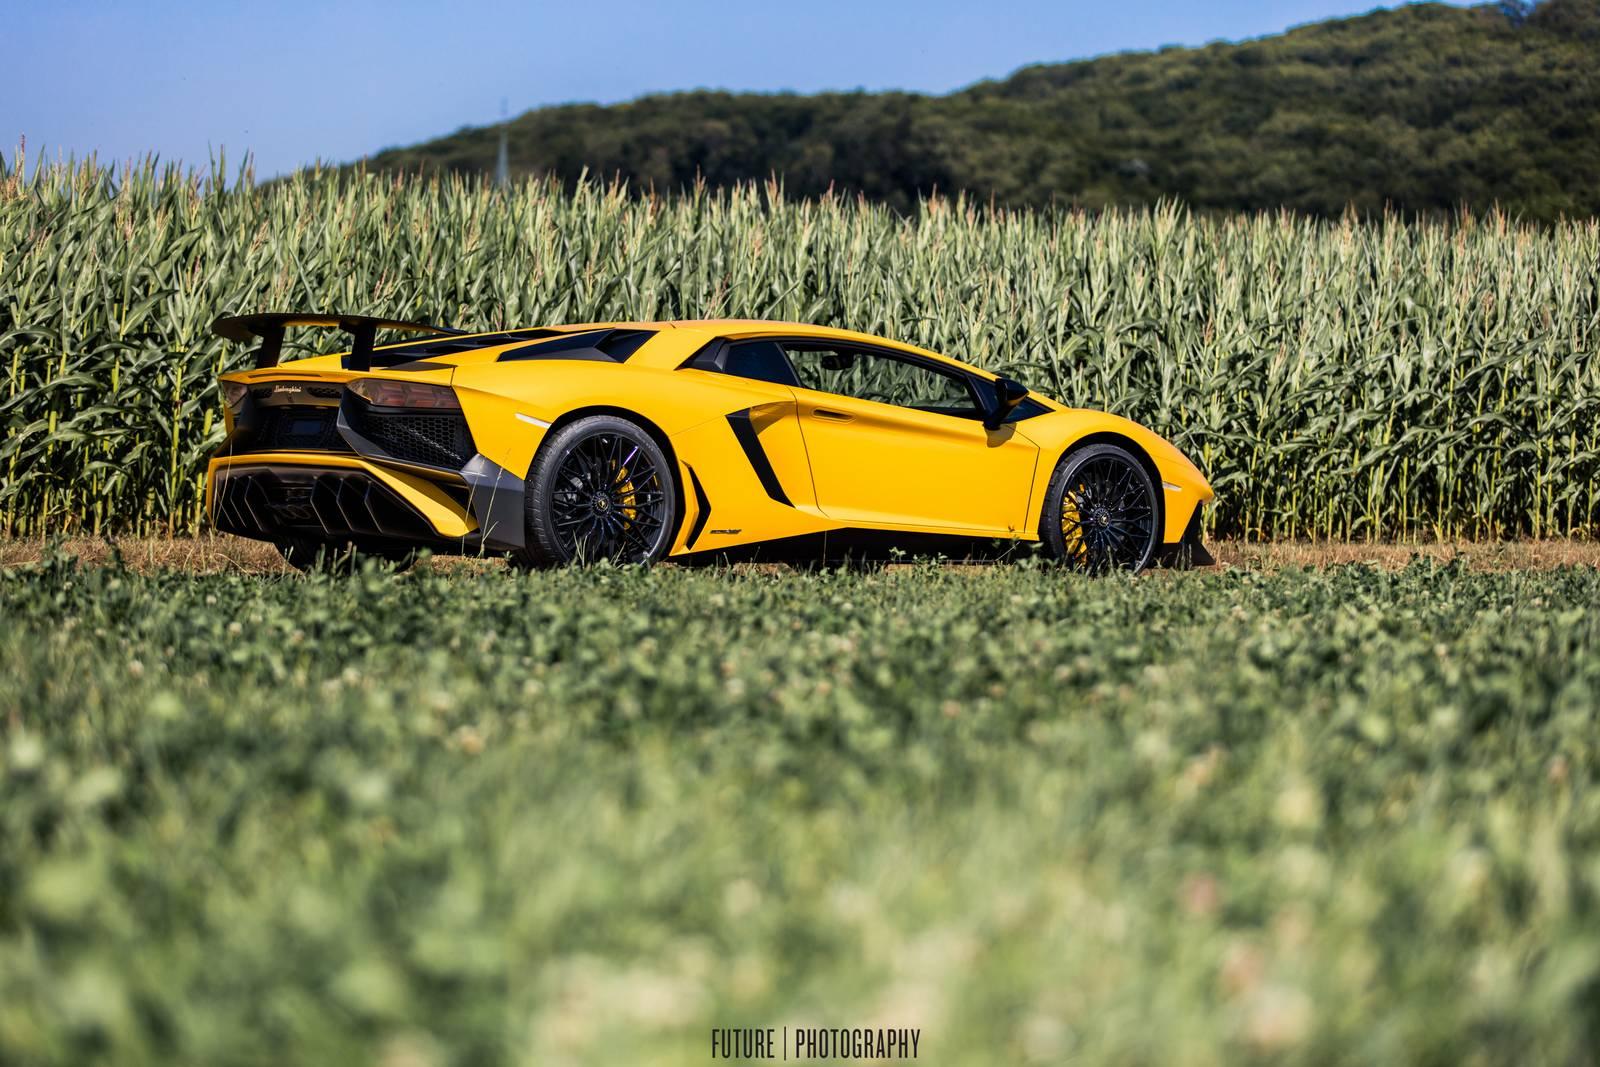 Bac Mono For Sale >> 5,000th Lamborghini Aventador Rolls Off Production Line - GTspirit